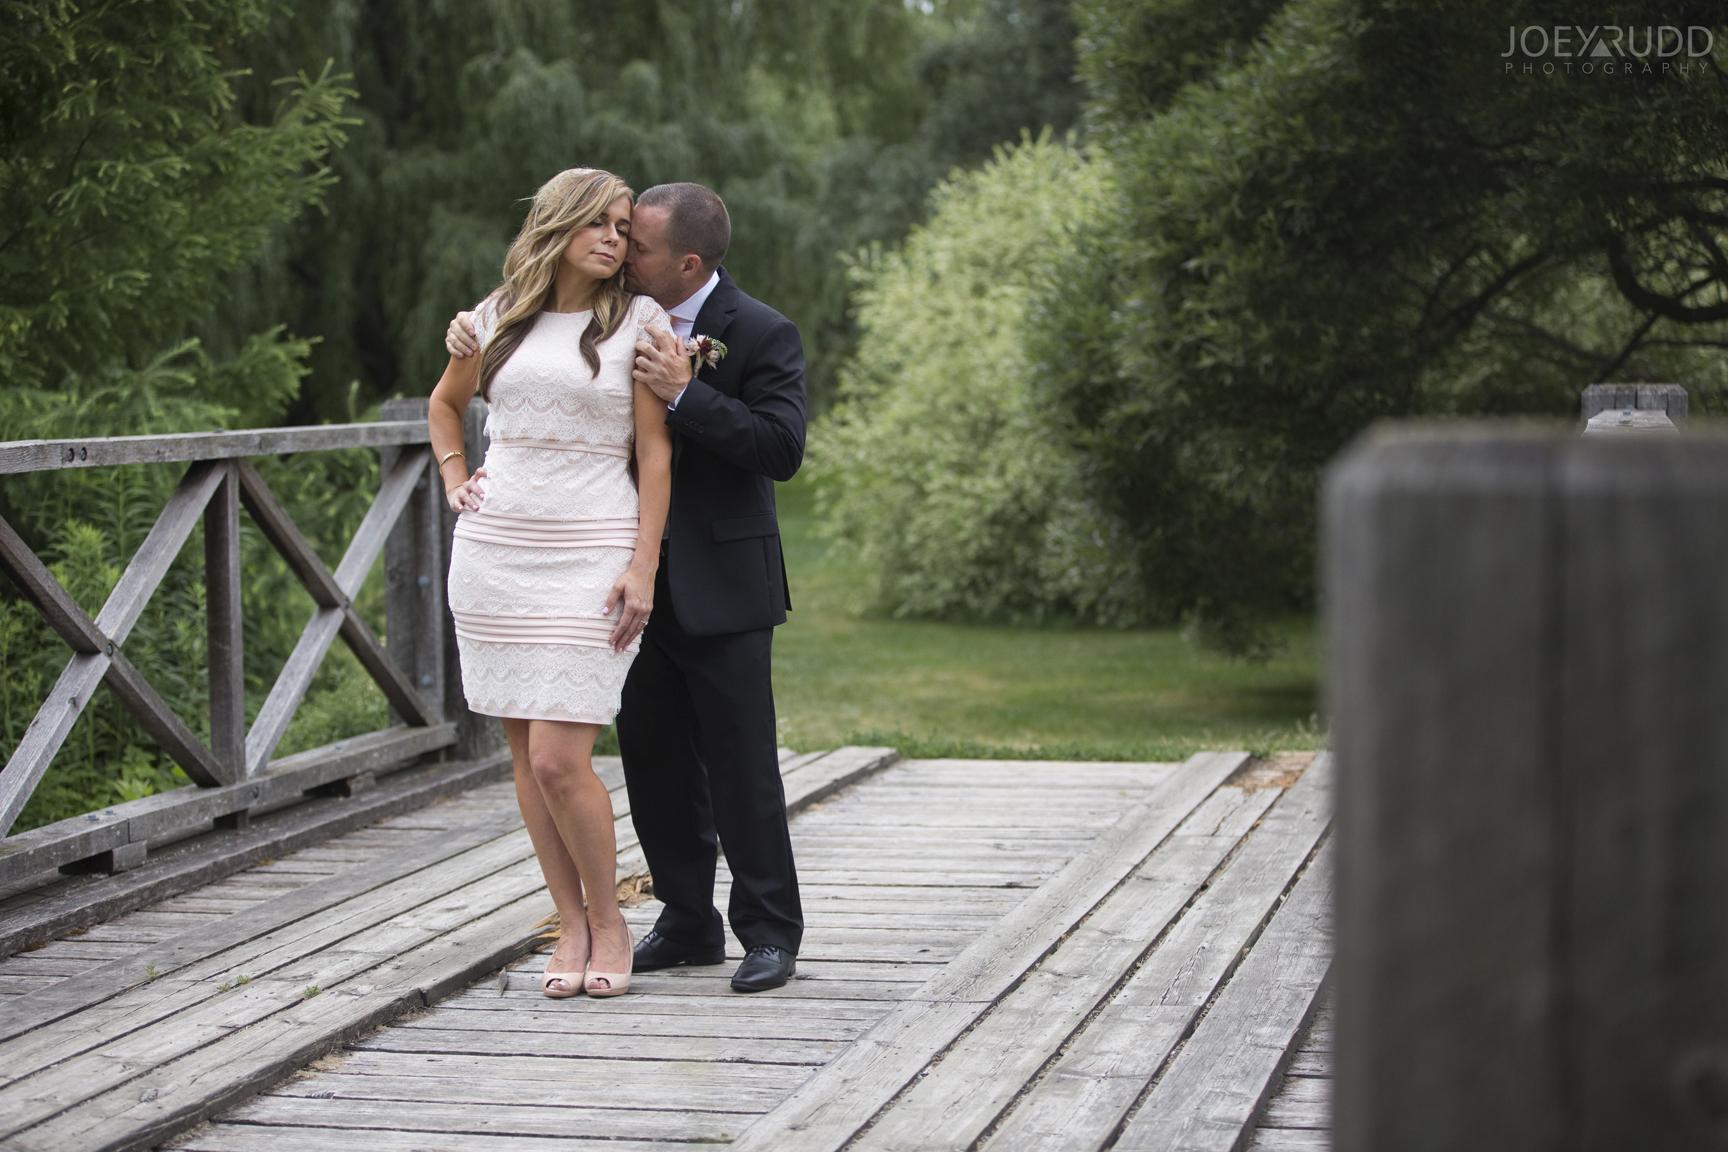 Elopement Wedding by Ottawa Wedding Photographer Joey Rudd Photography Arboretum Bridge